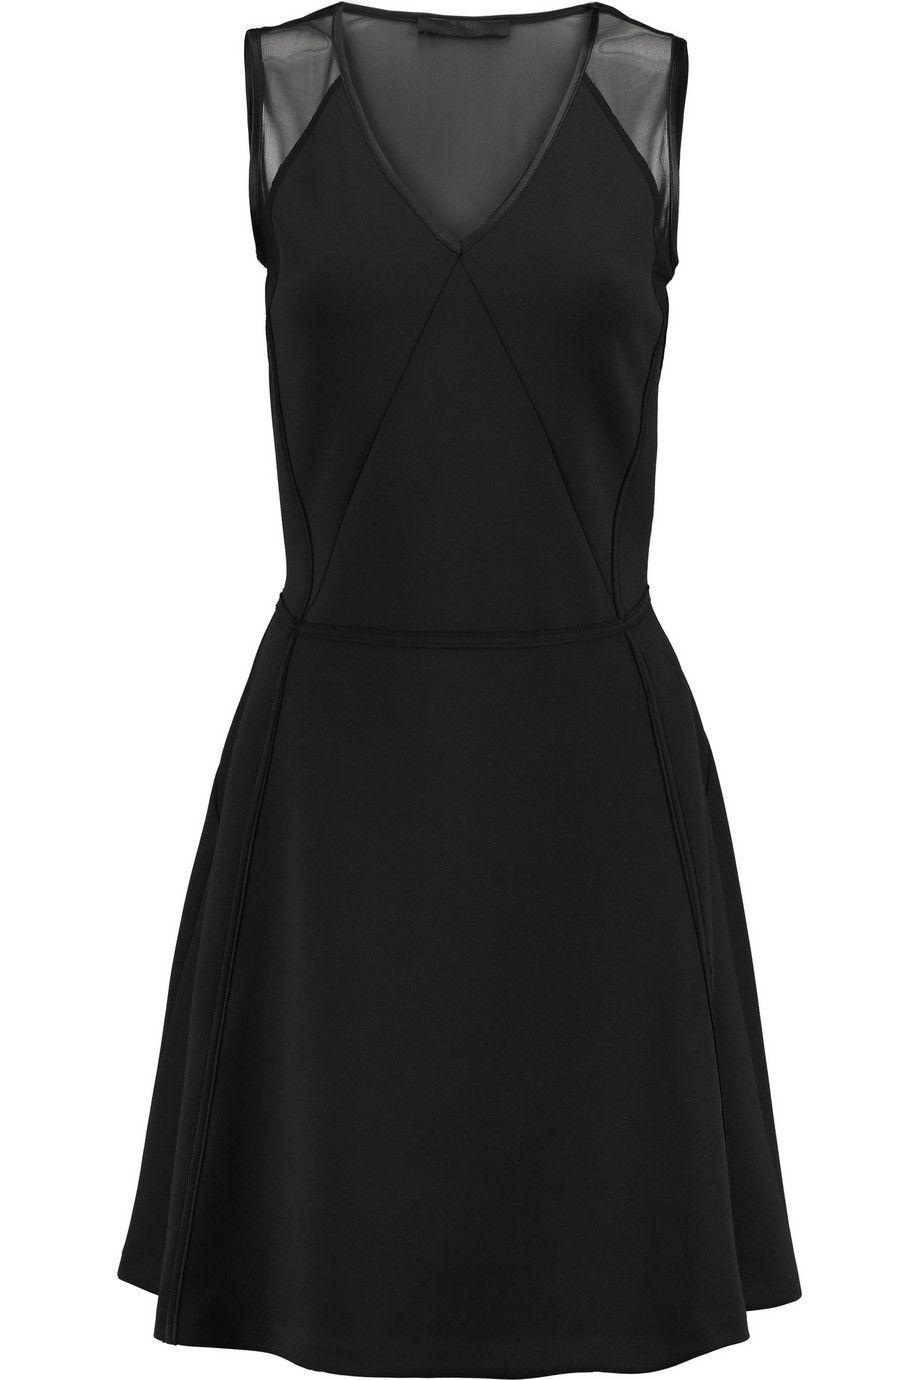 Karl Lagerfeld Jade mesh-paneled stretch-jersey dress